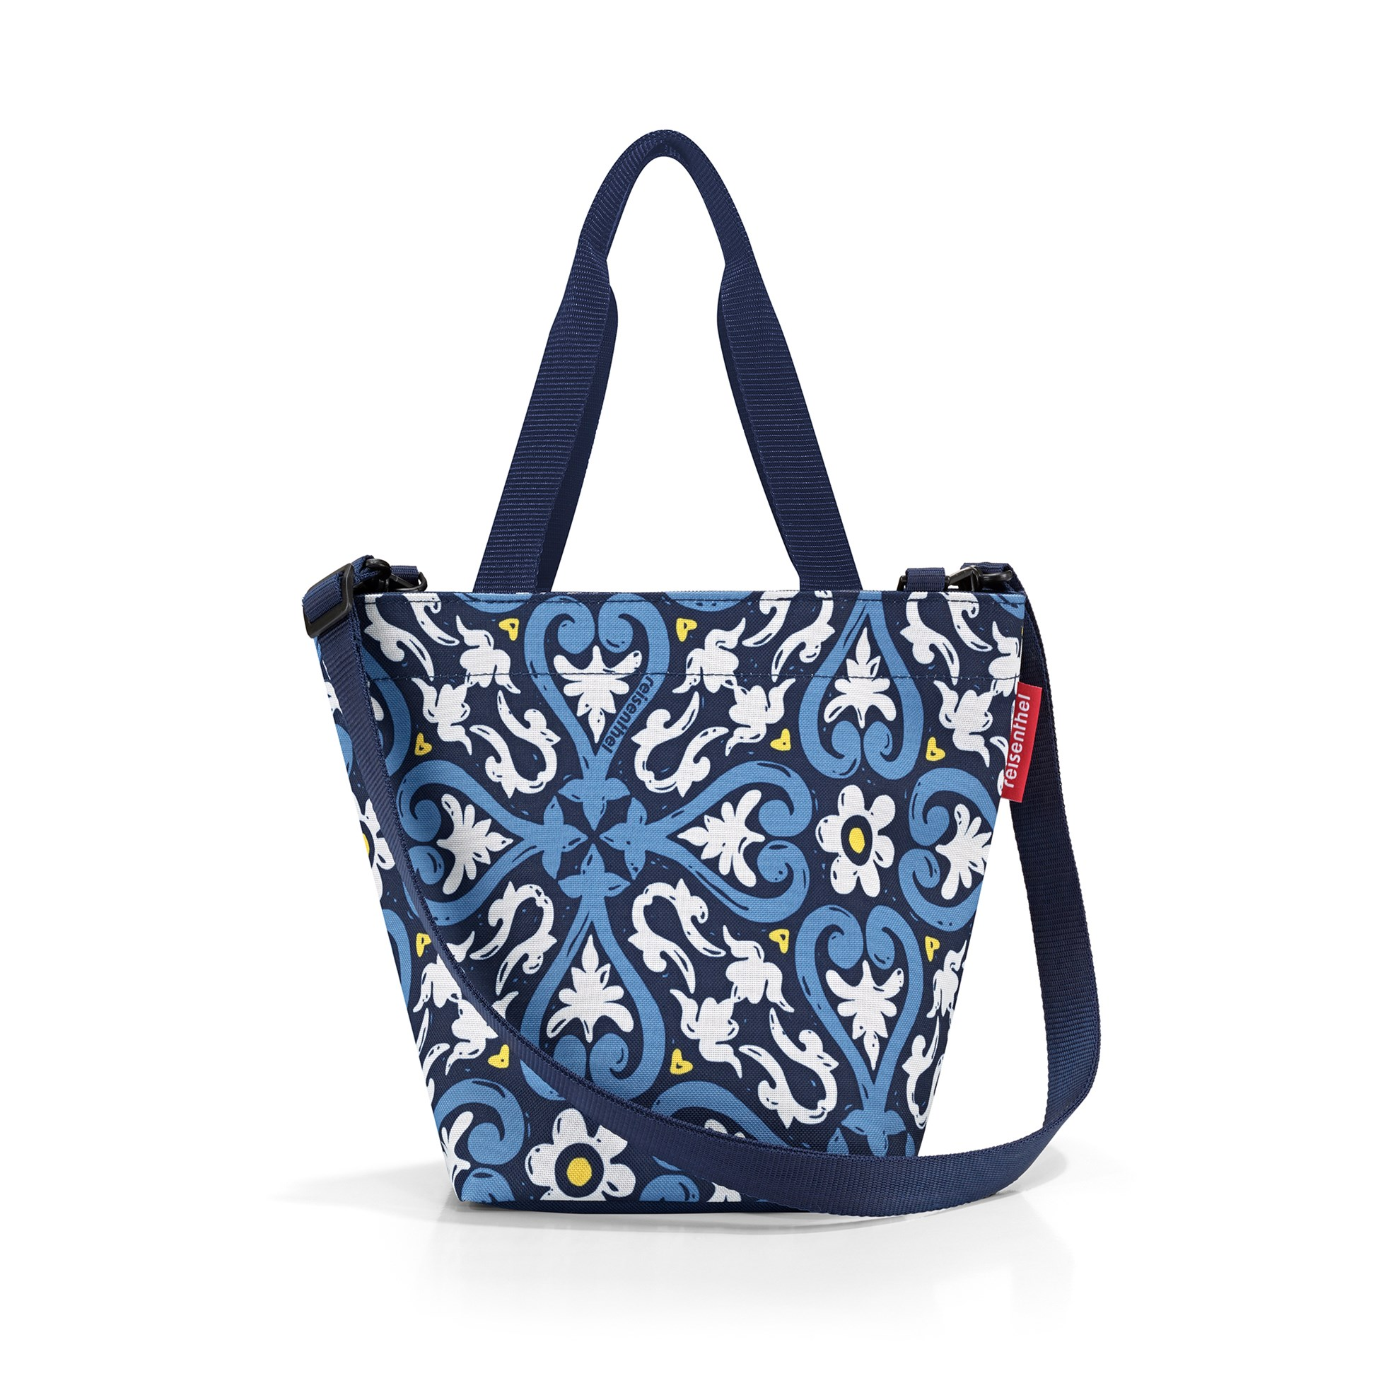 Taška/kabelka Shopper XS floral 1_2